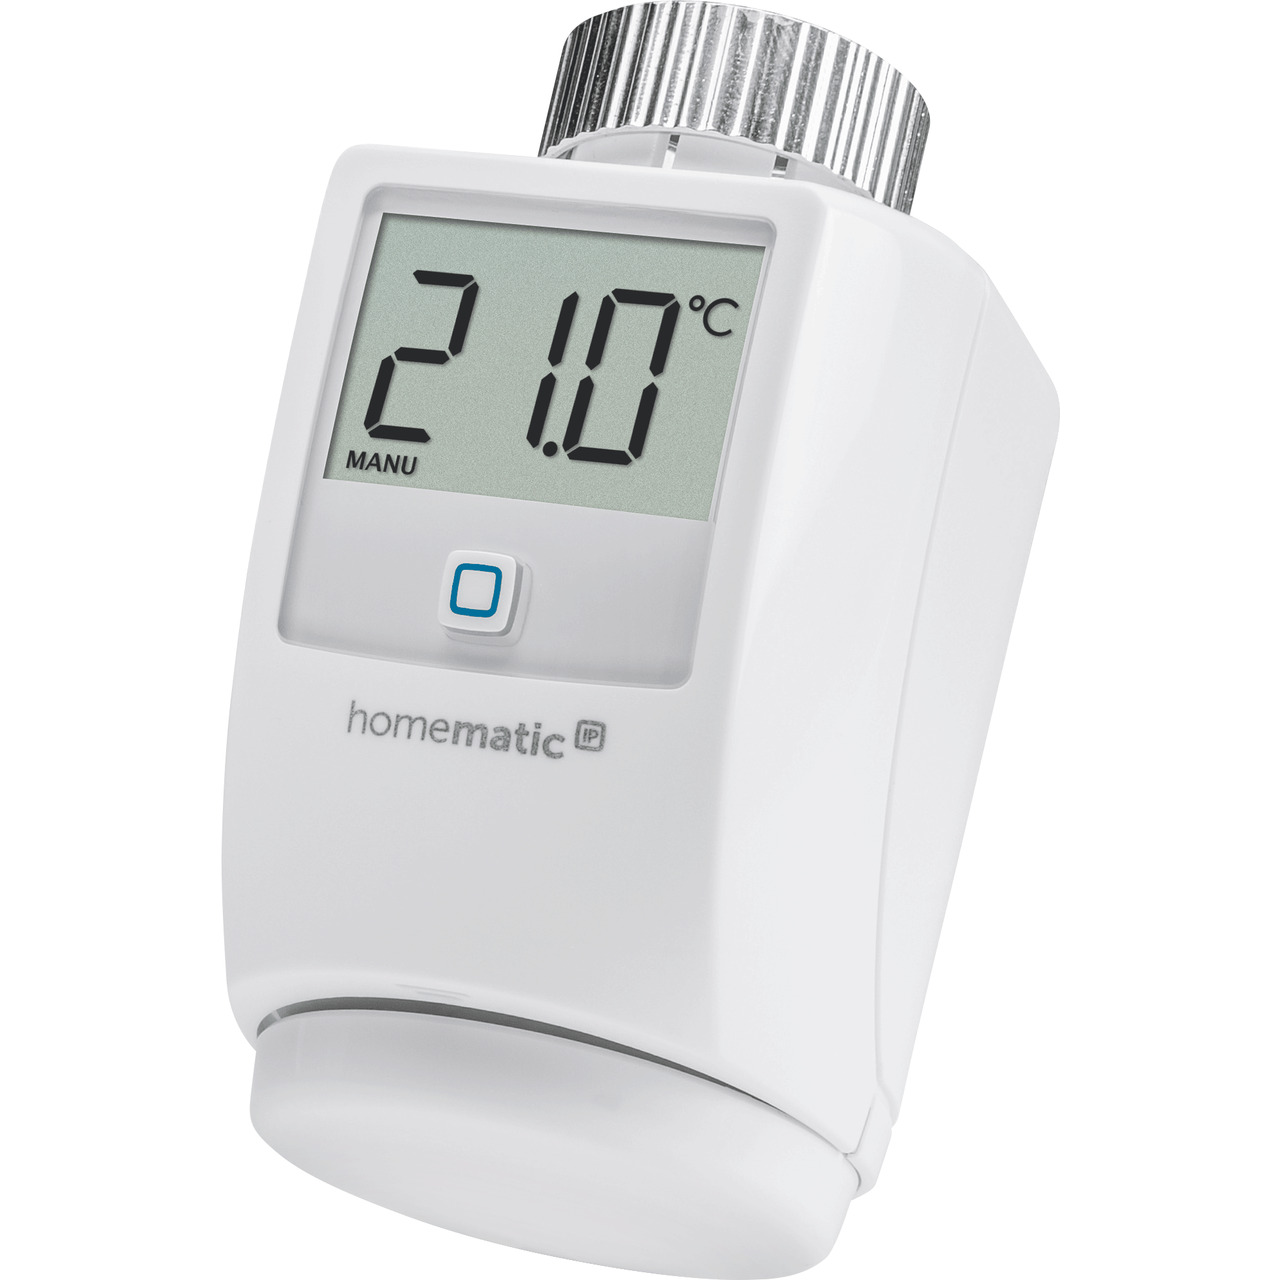 Homematic IP Smart Home Heizkörperthermostat HMIP-eTRV-2